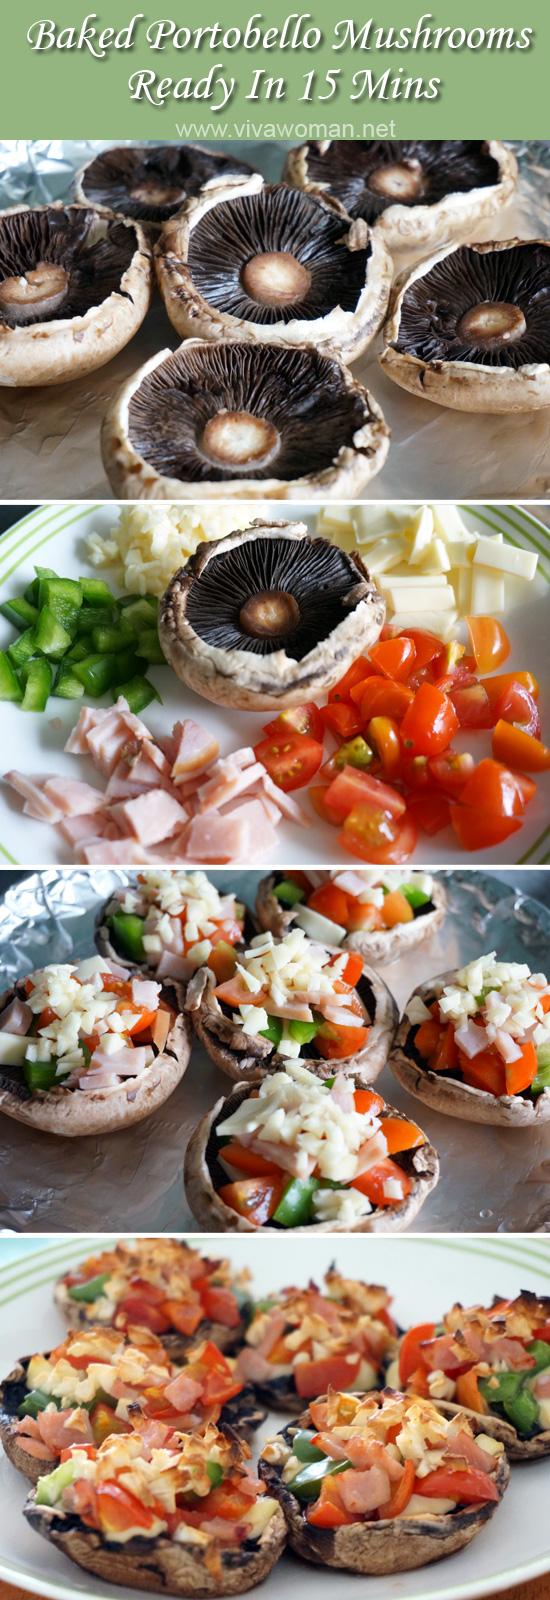 Baked-Portobello-Mushrooms